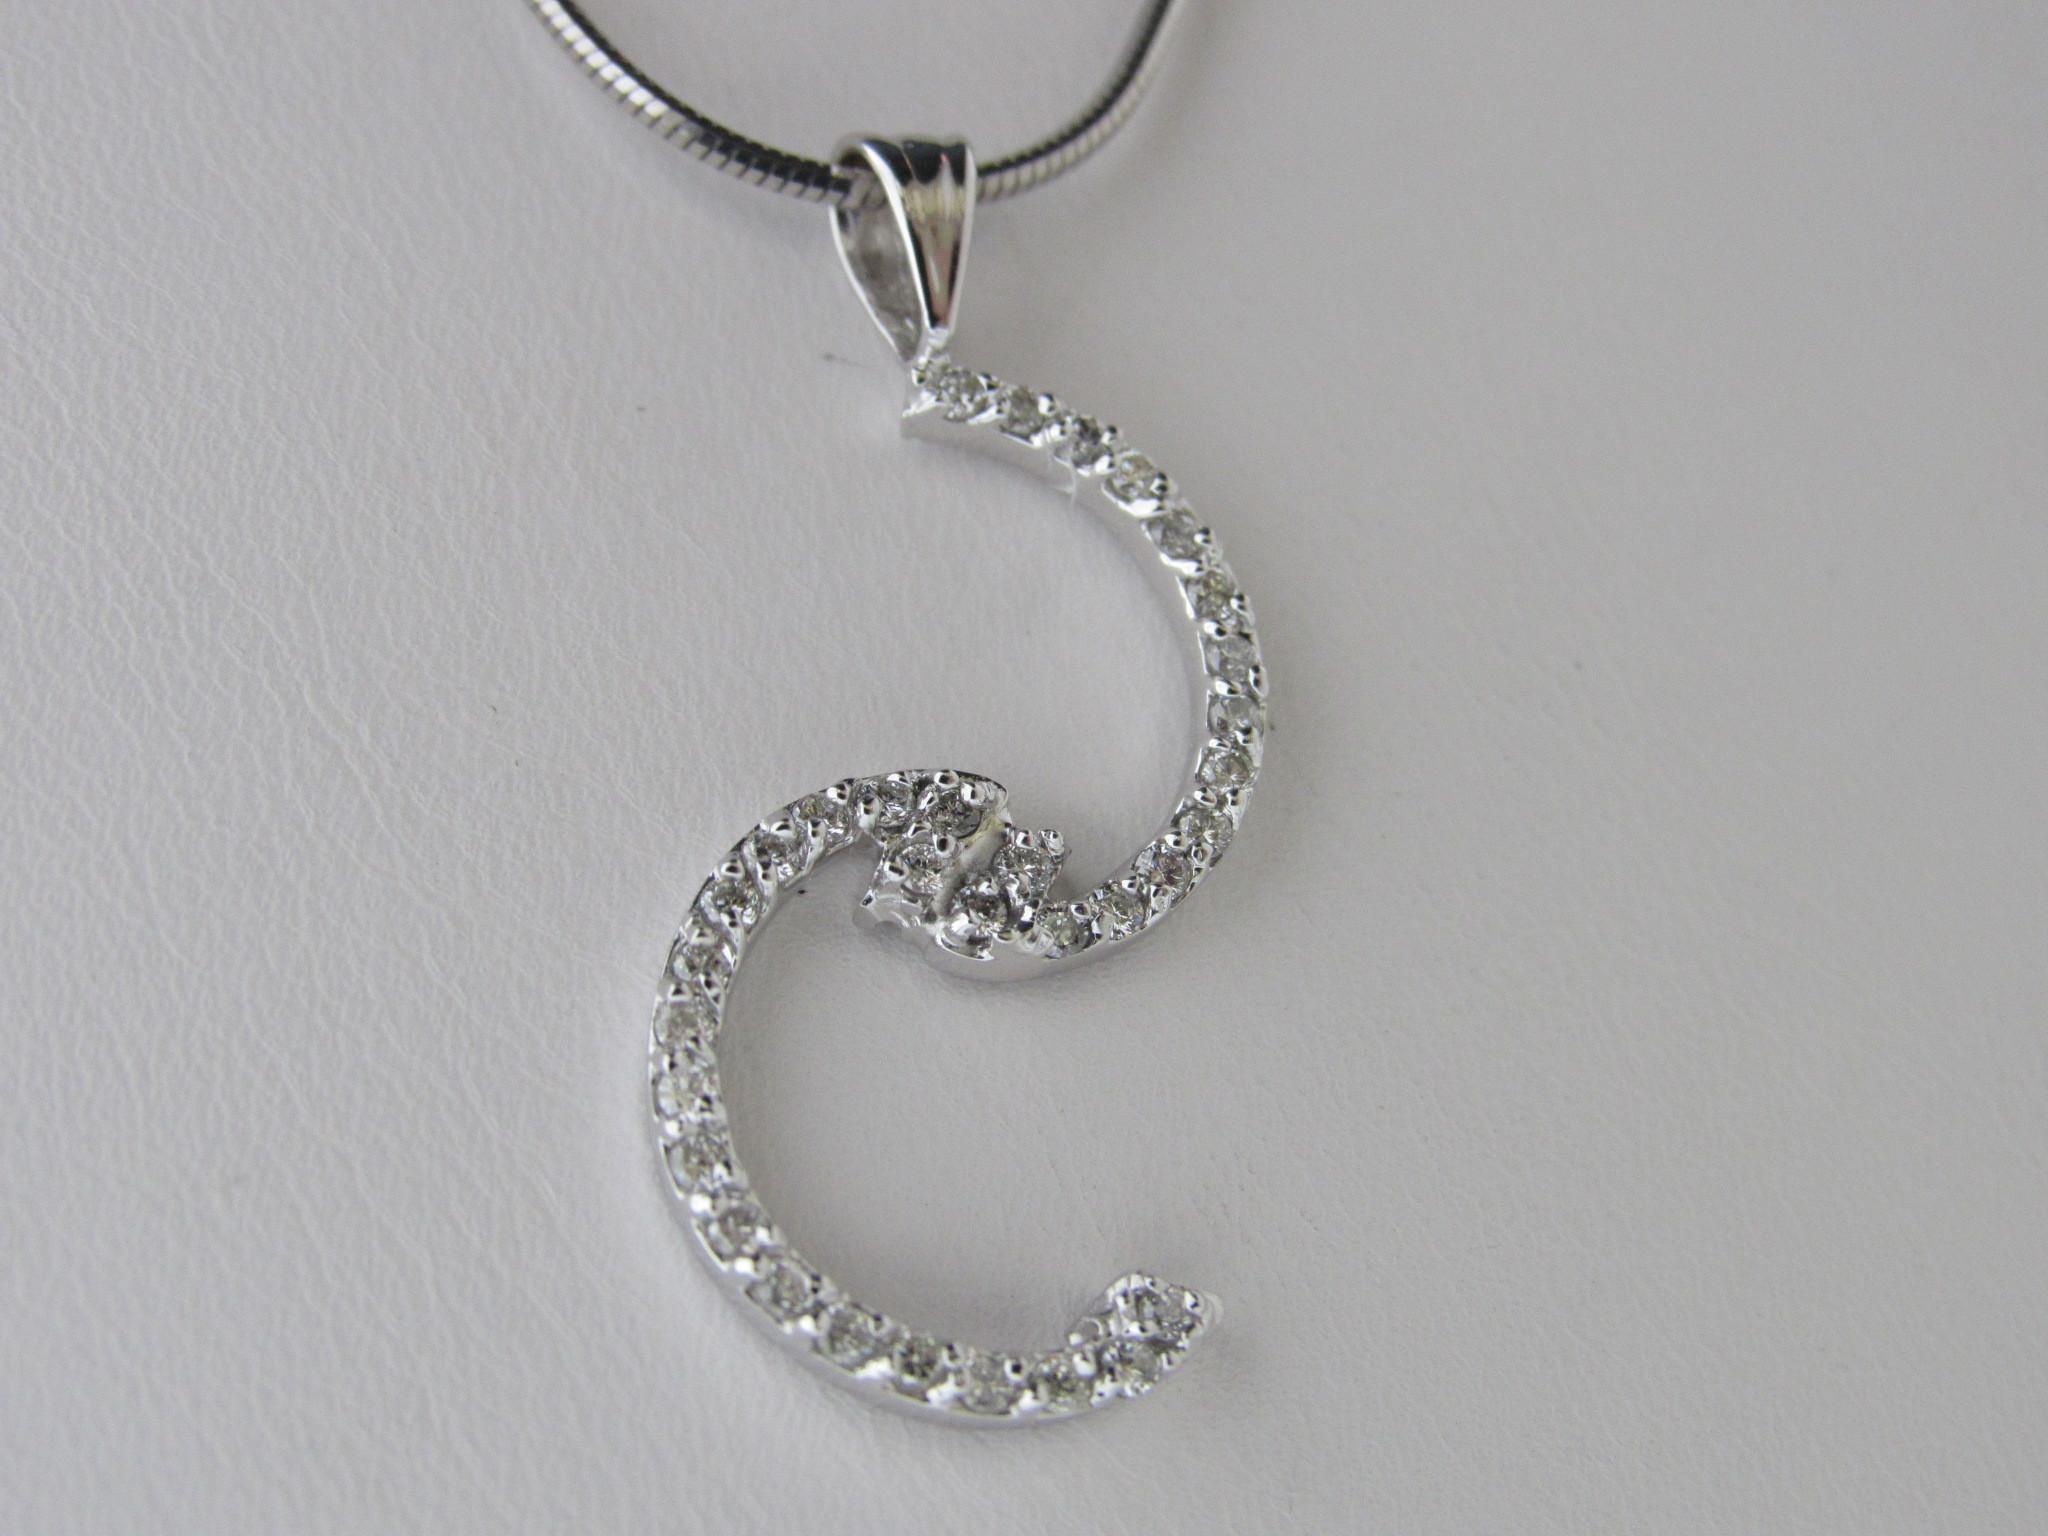 1 2 carat diamond pendant necklace best necklace 2017 pear shape 1 2 carat diamond pendant in 14k yellow gold jewelry aloadofball Choice Image